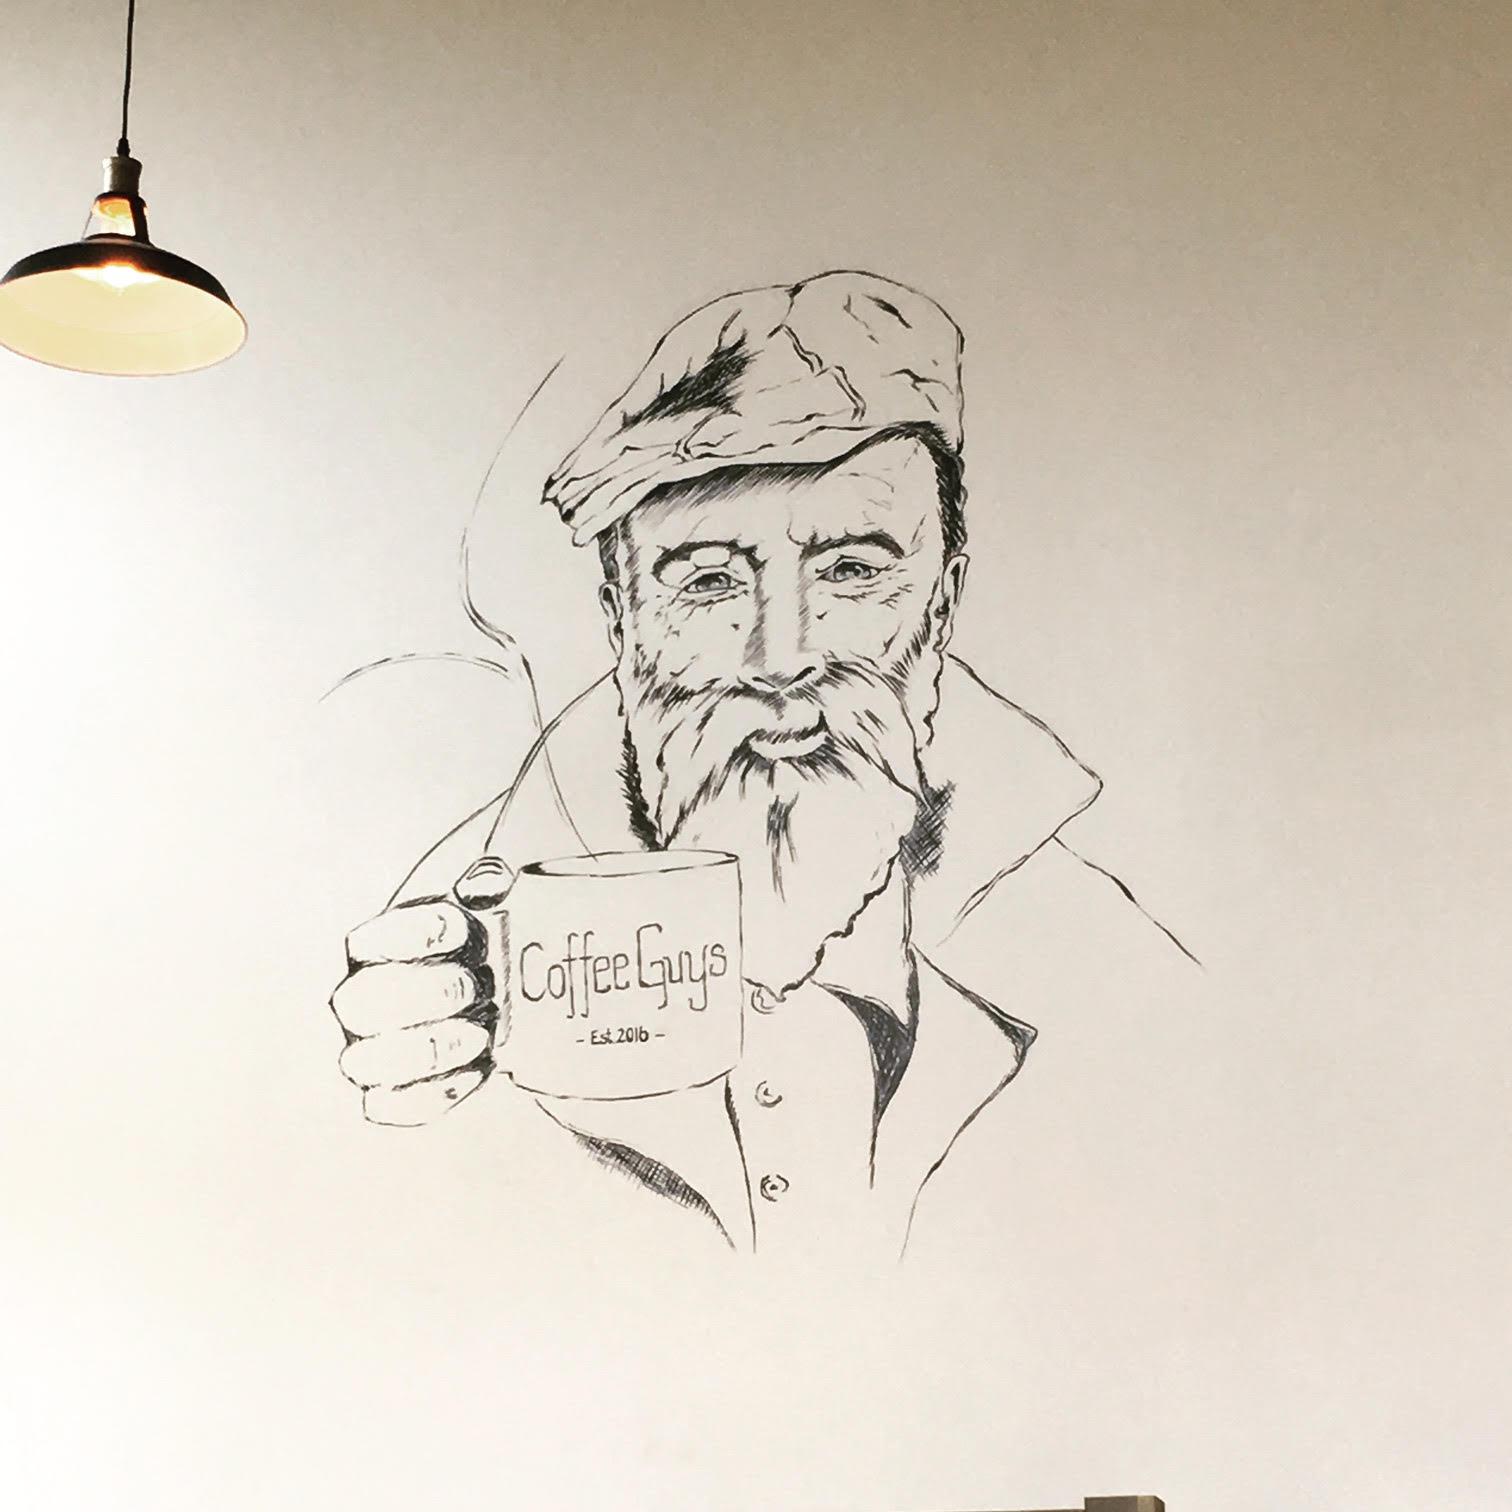 Coffee Guys.png